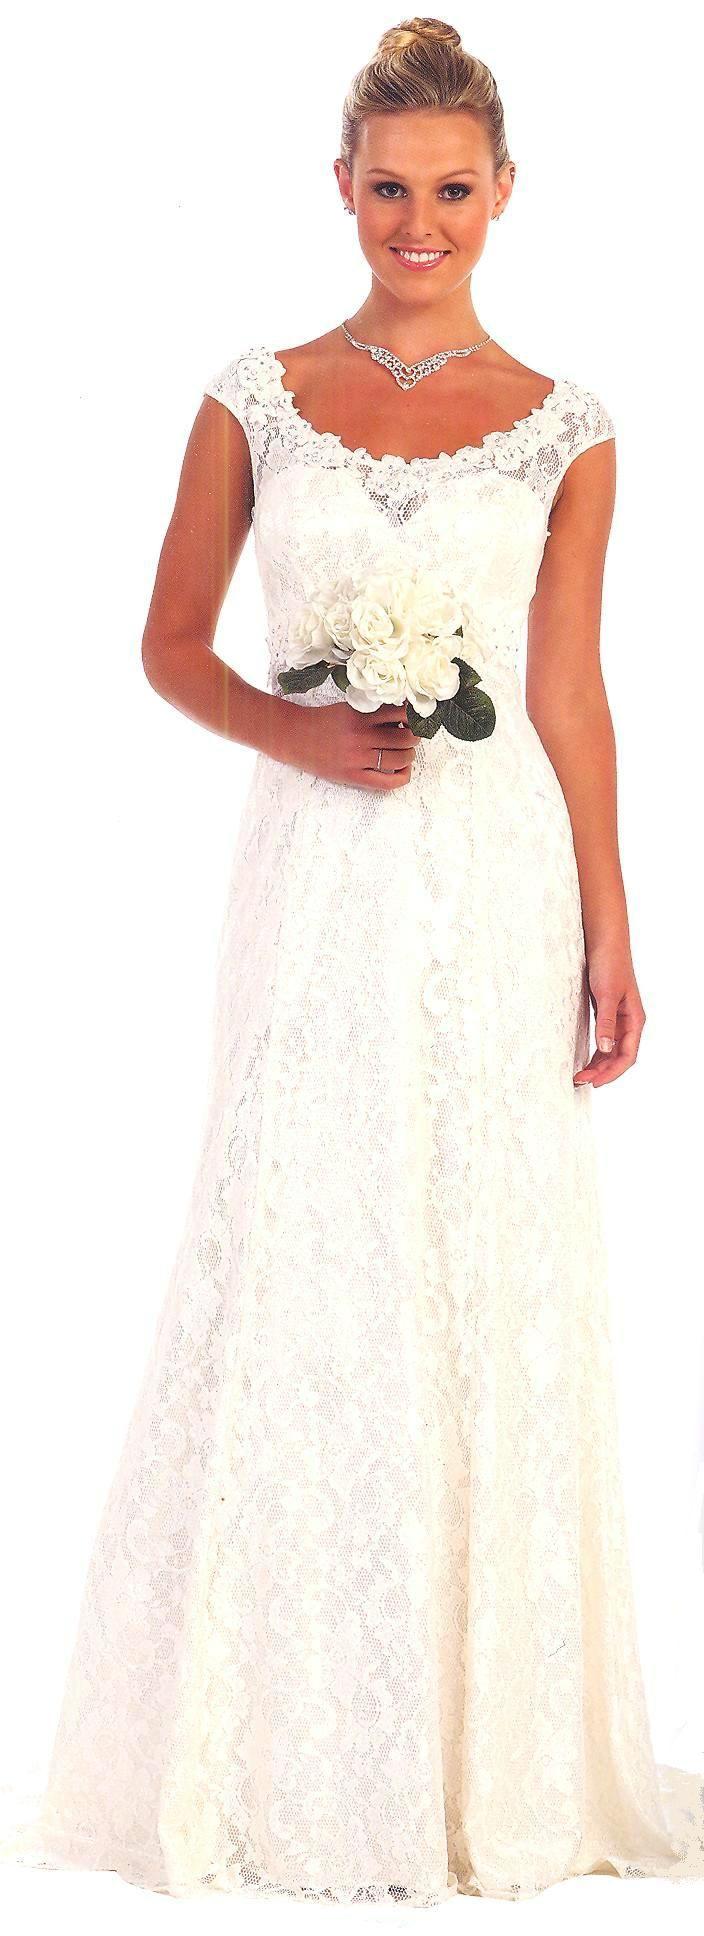 Wedding dresses under $200  Wedding Dress Prom Dresses UNDER ucBRueafaucBRueLace dress with